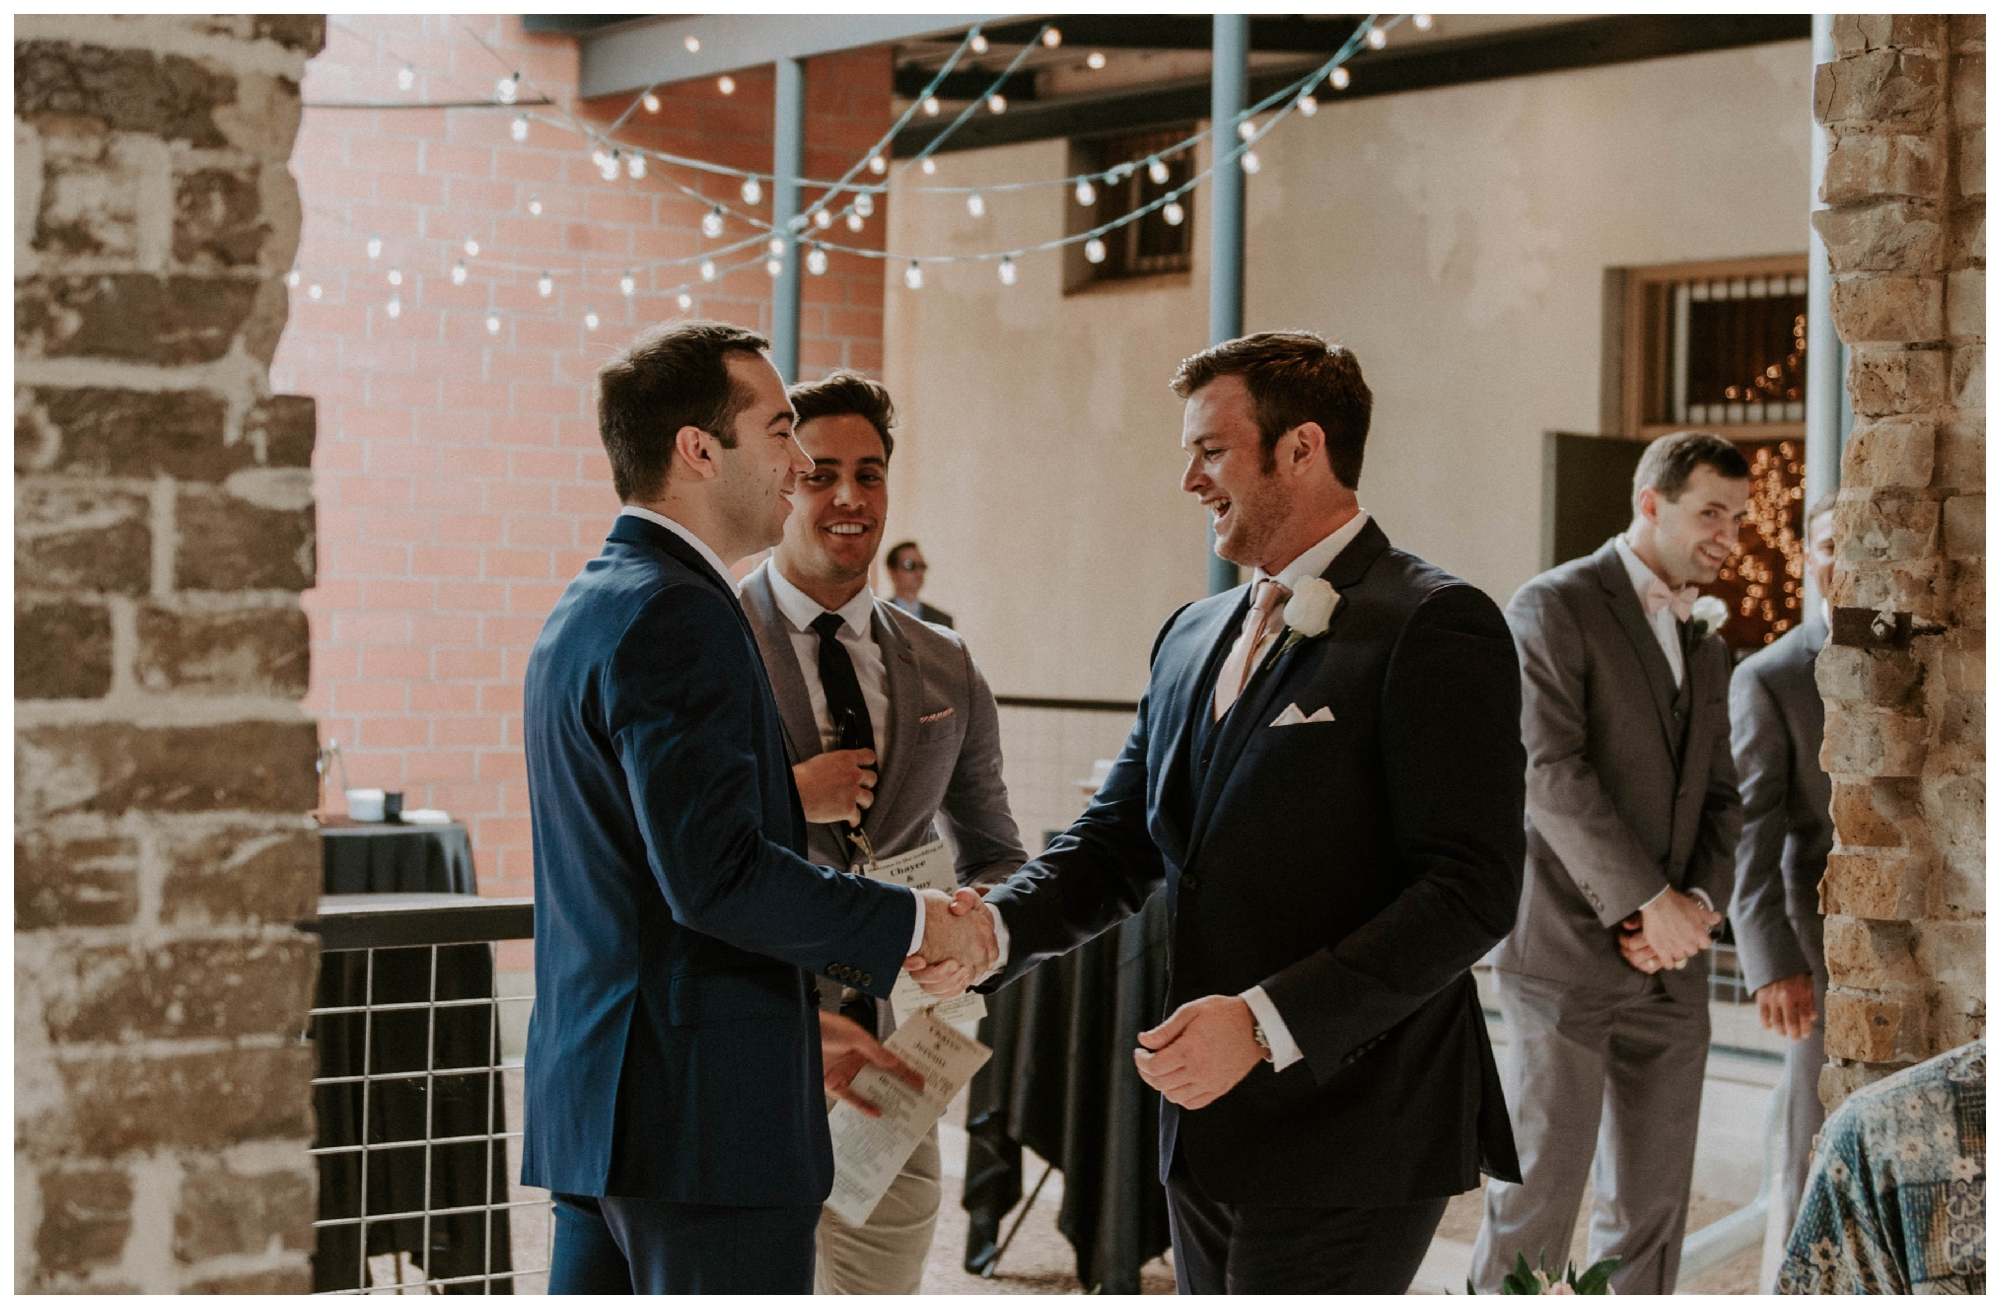 austin-texas-wedding-photography-1778-photographie_0045.jpg